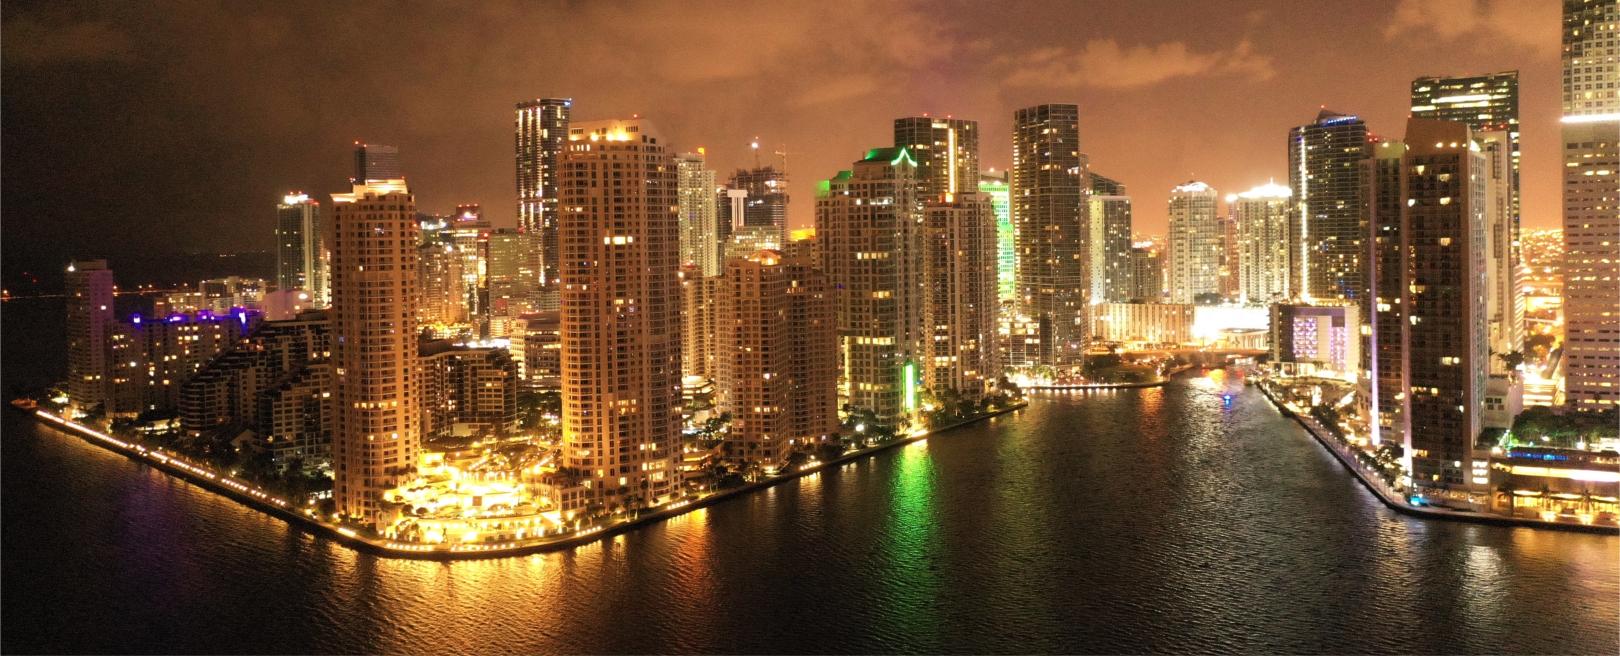 Miami_Night_8.jpg